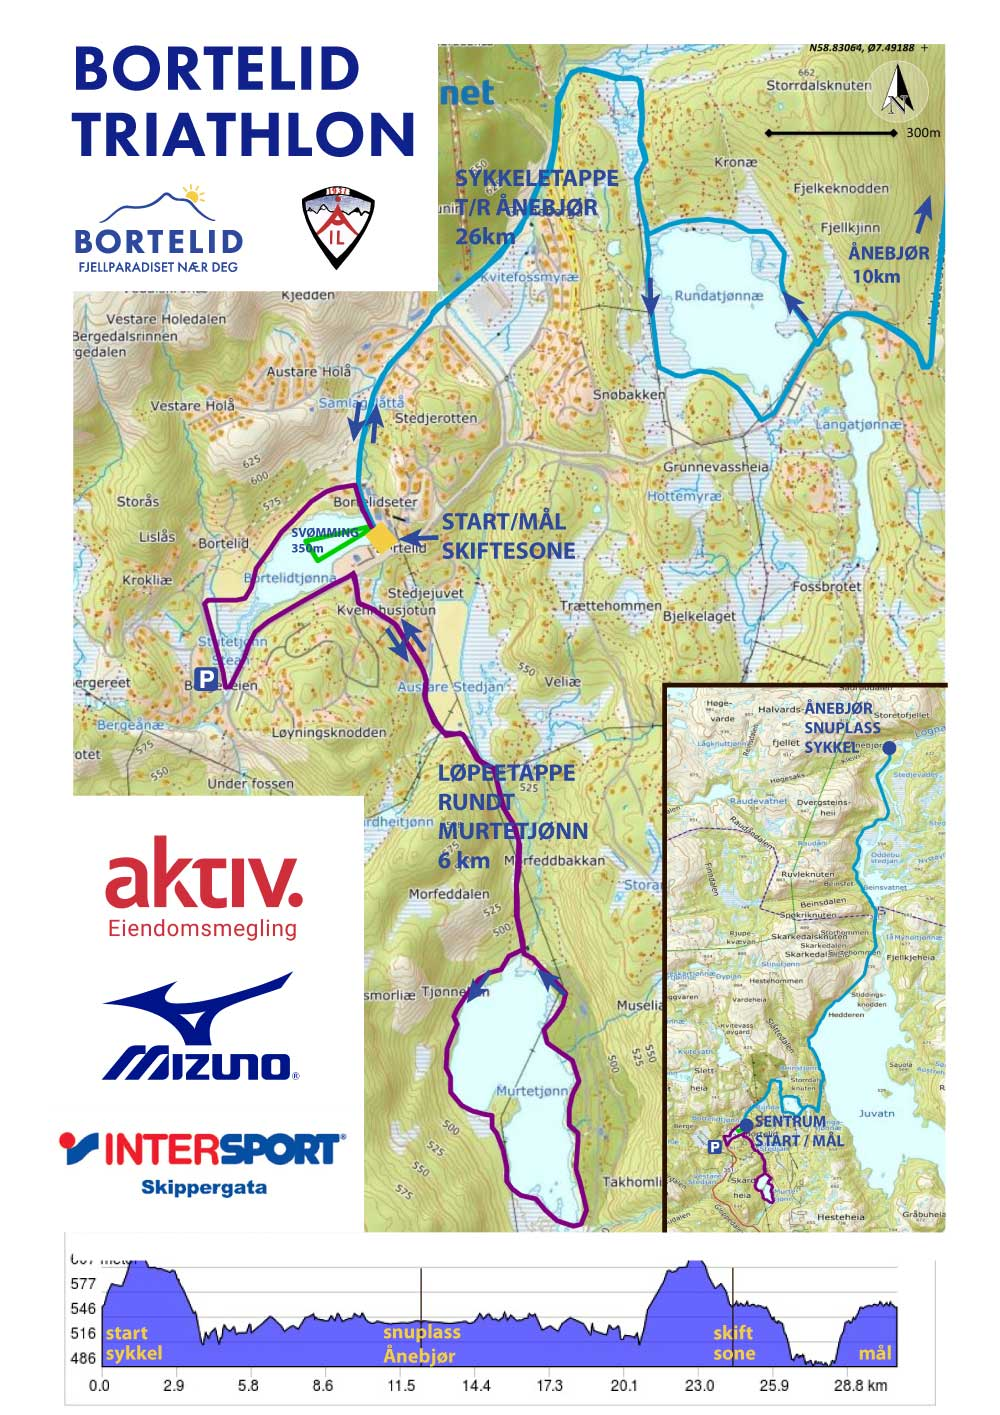 Løypekart-bortelid-Triathlon.jpg